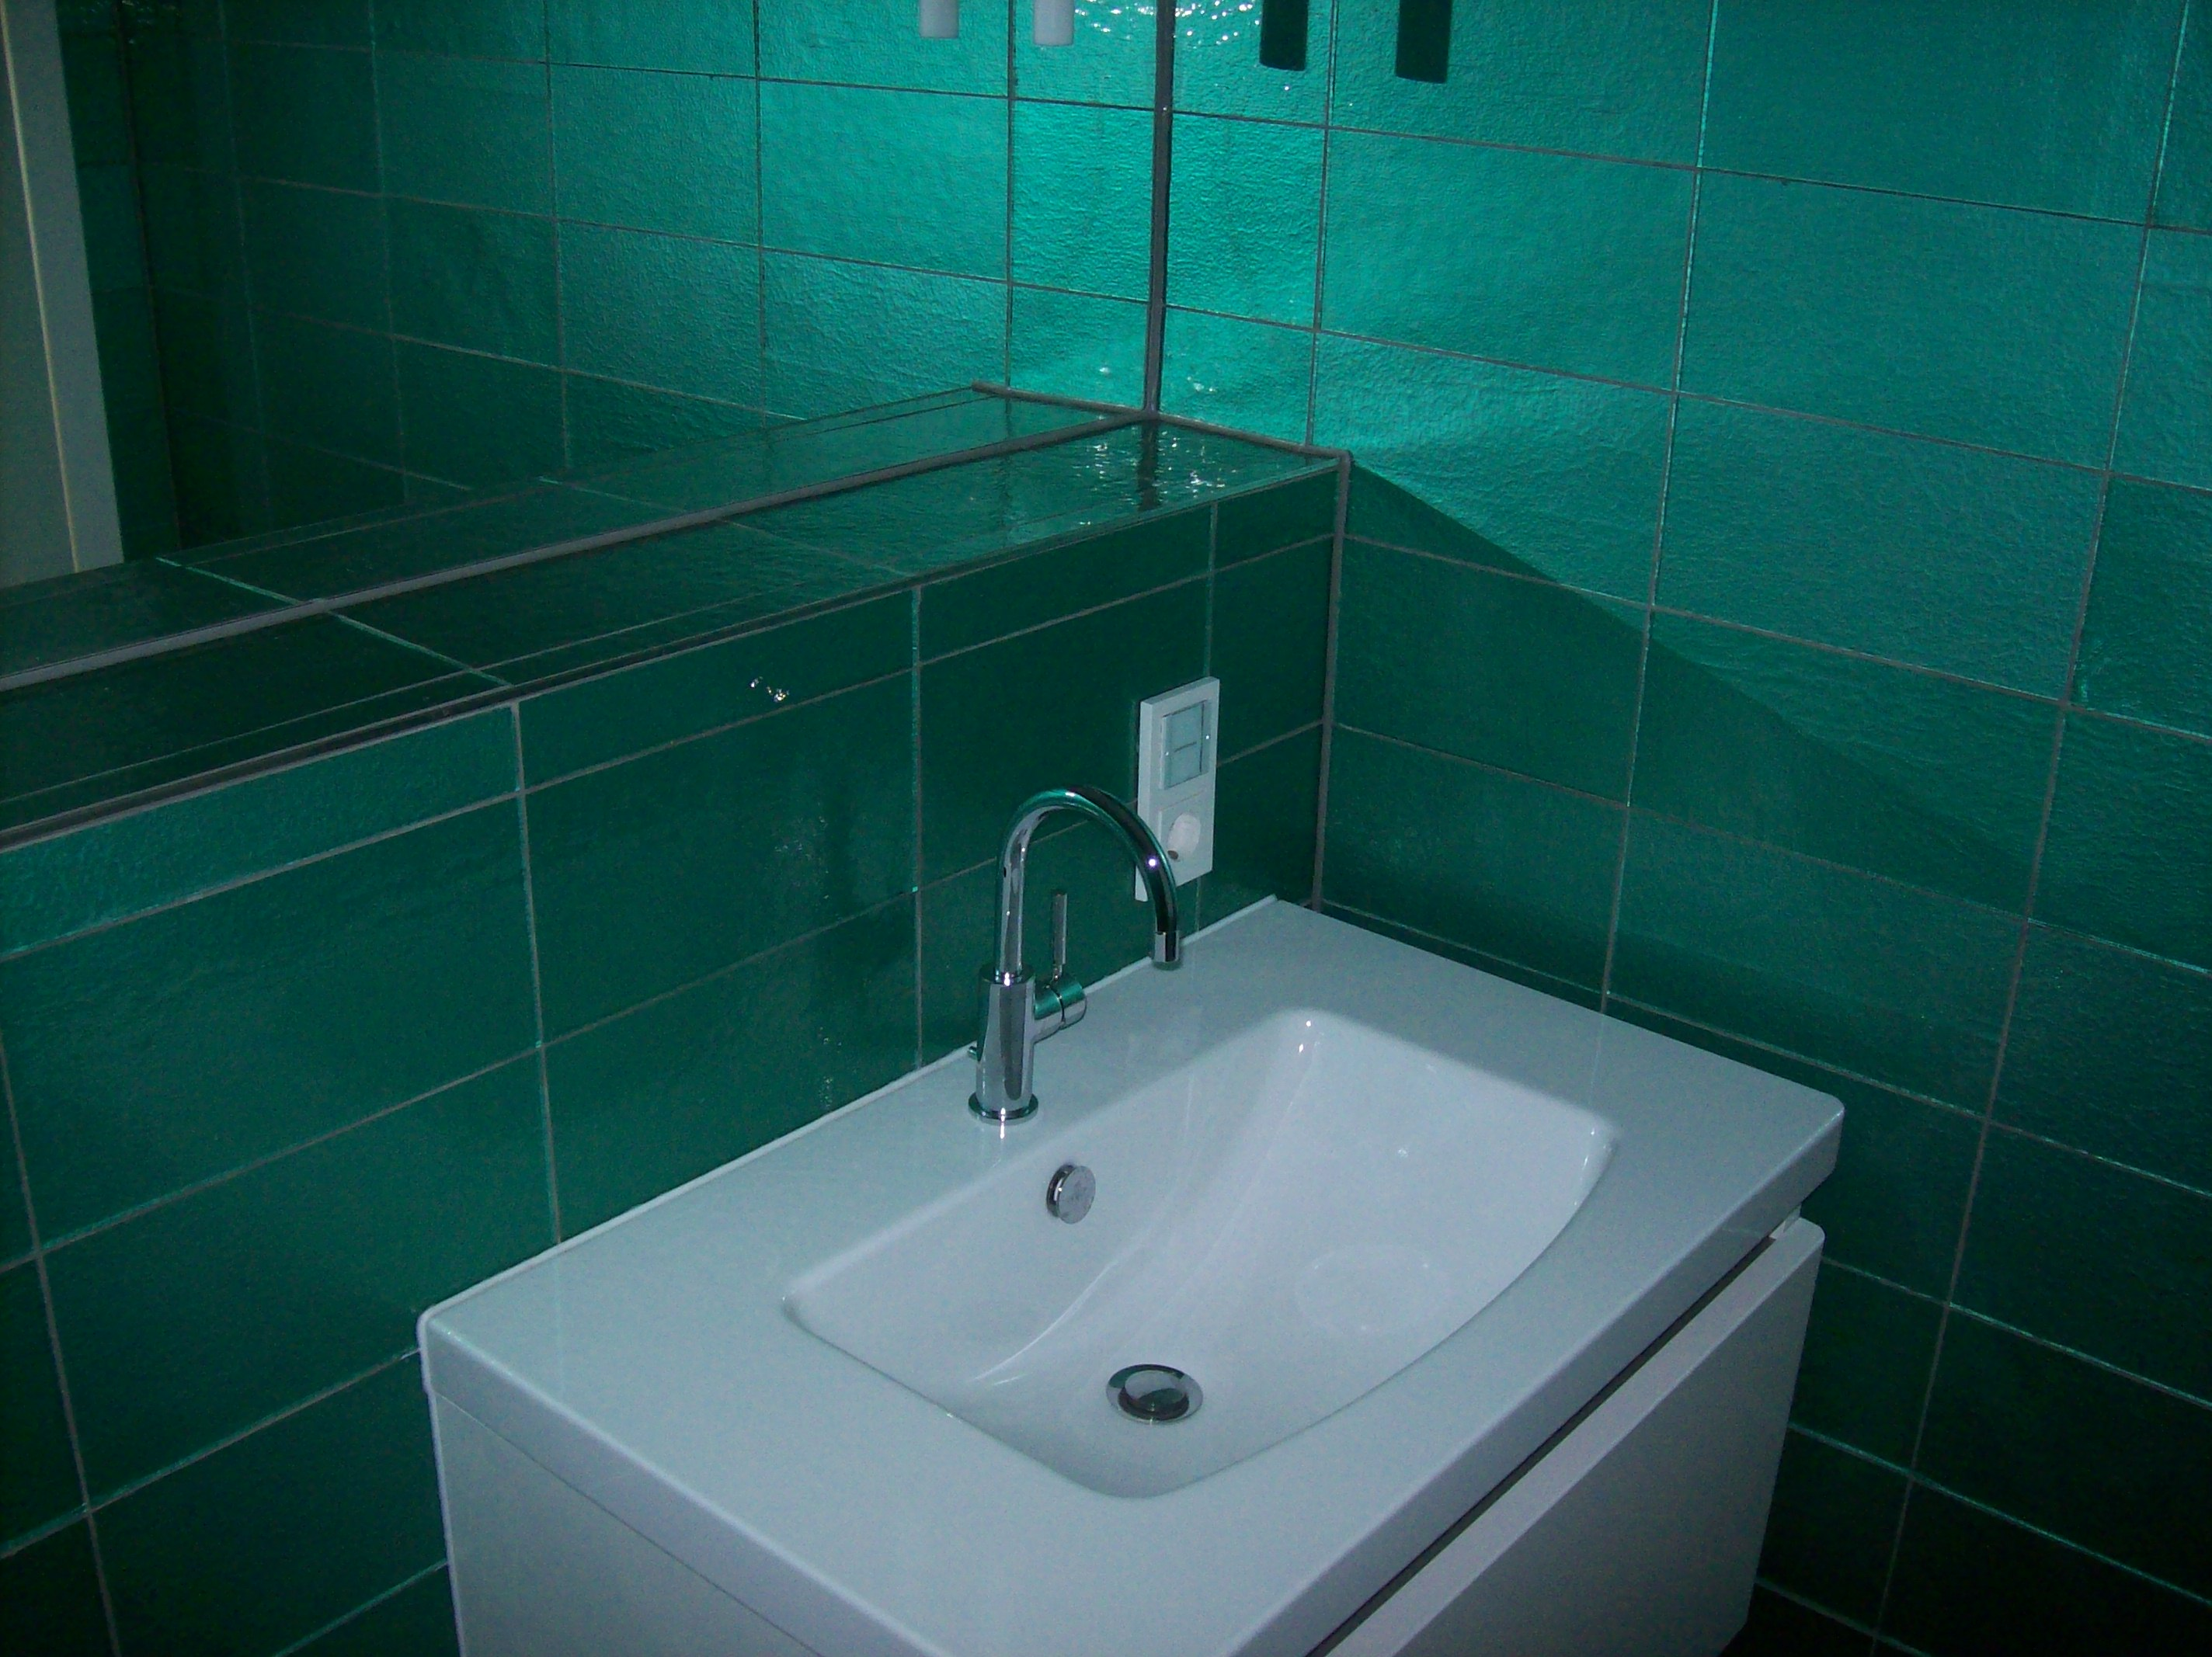 traumbad von bad musterb der. Black Bedroom Furniture Sets. Home Design Ideas